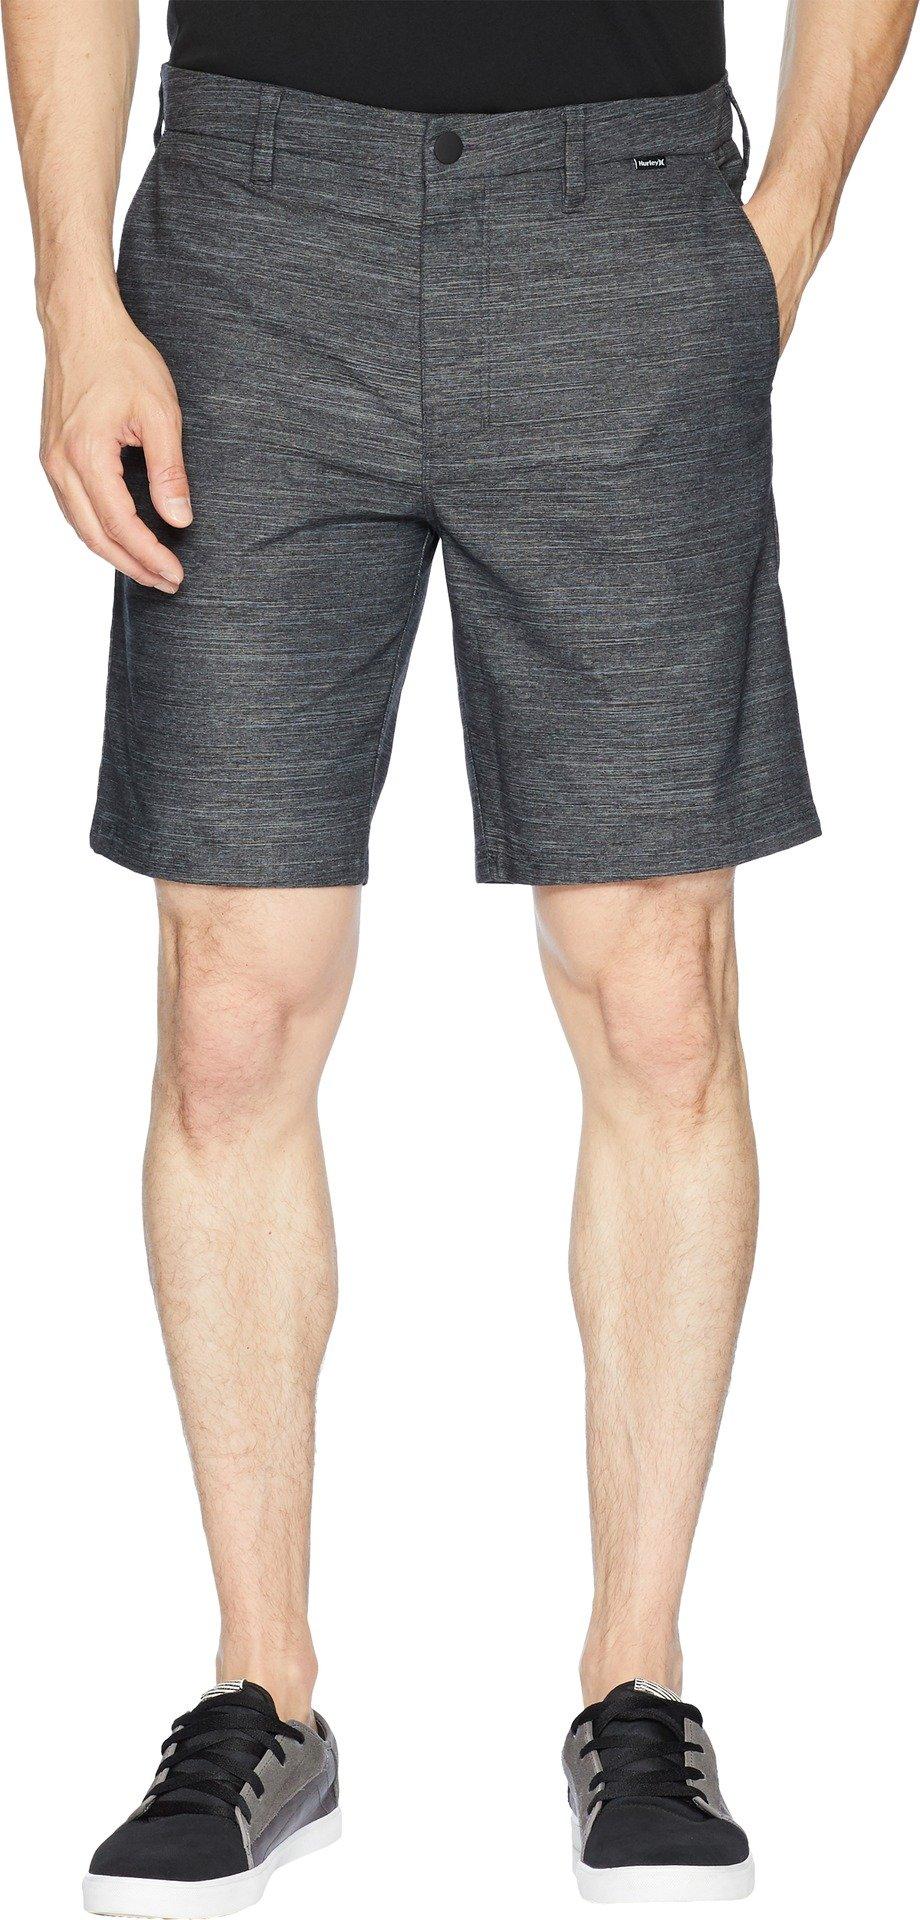 Hurley Drifit Breathe Foot Walk Shorts 36 inch Black